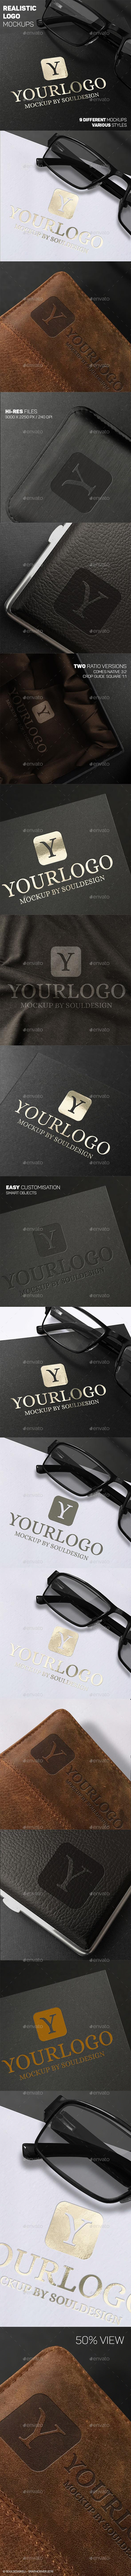 Premium Realistic Logo Mockups - Logo Product Mock-Ups